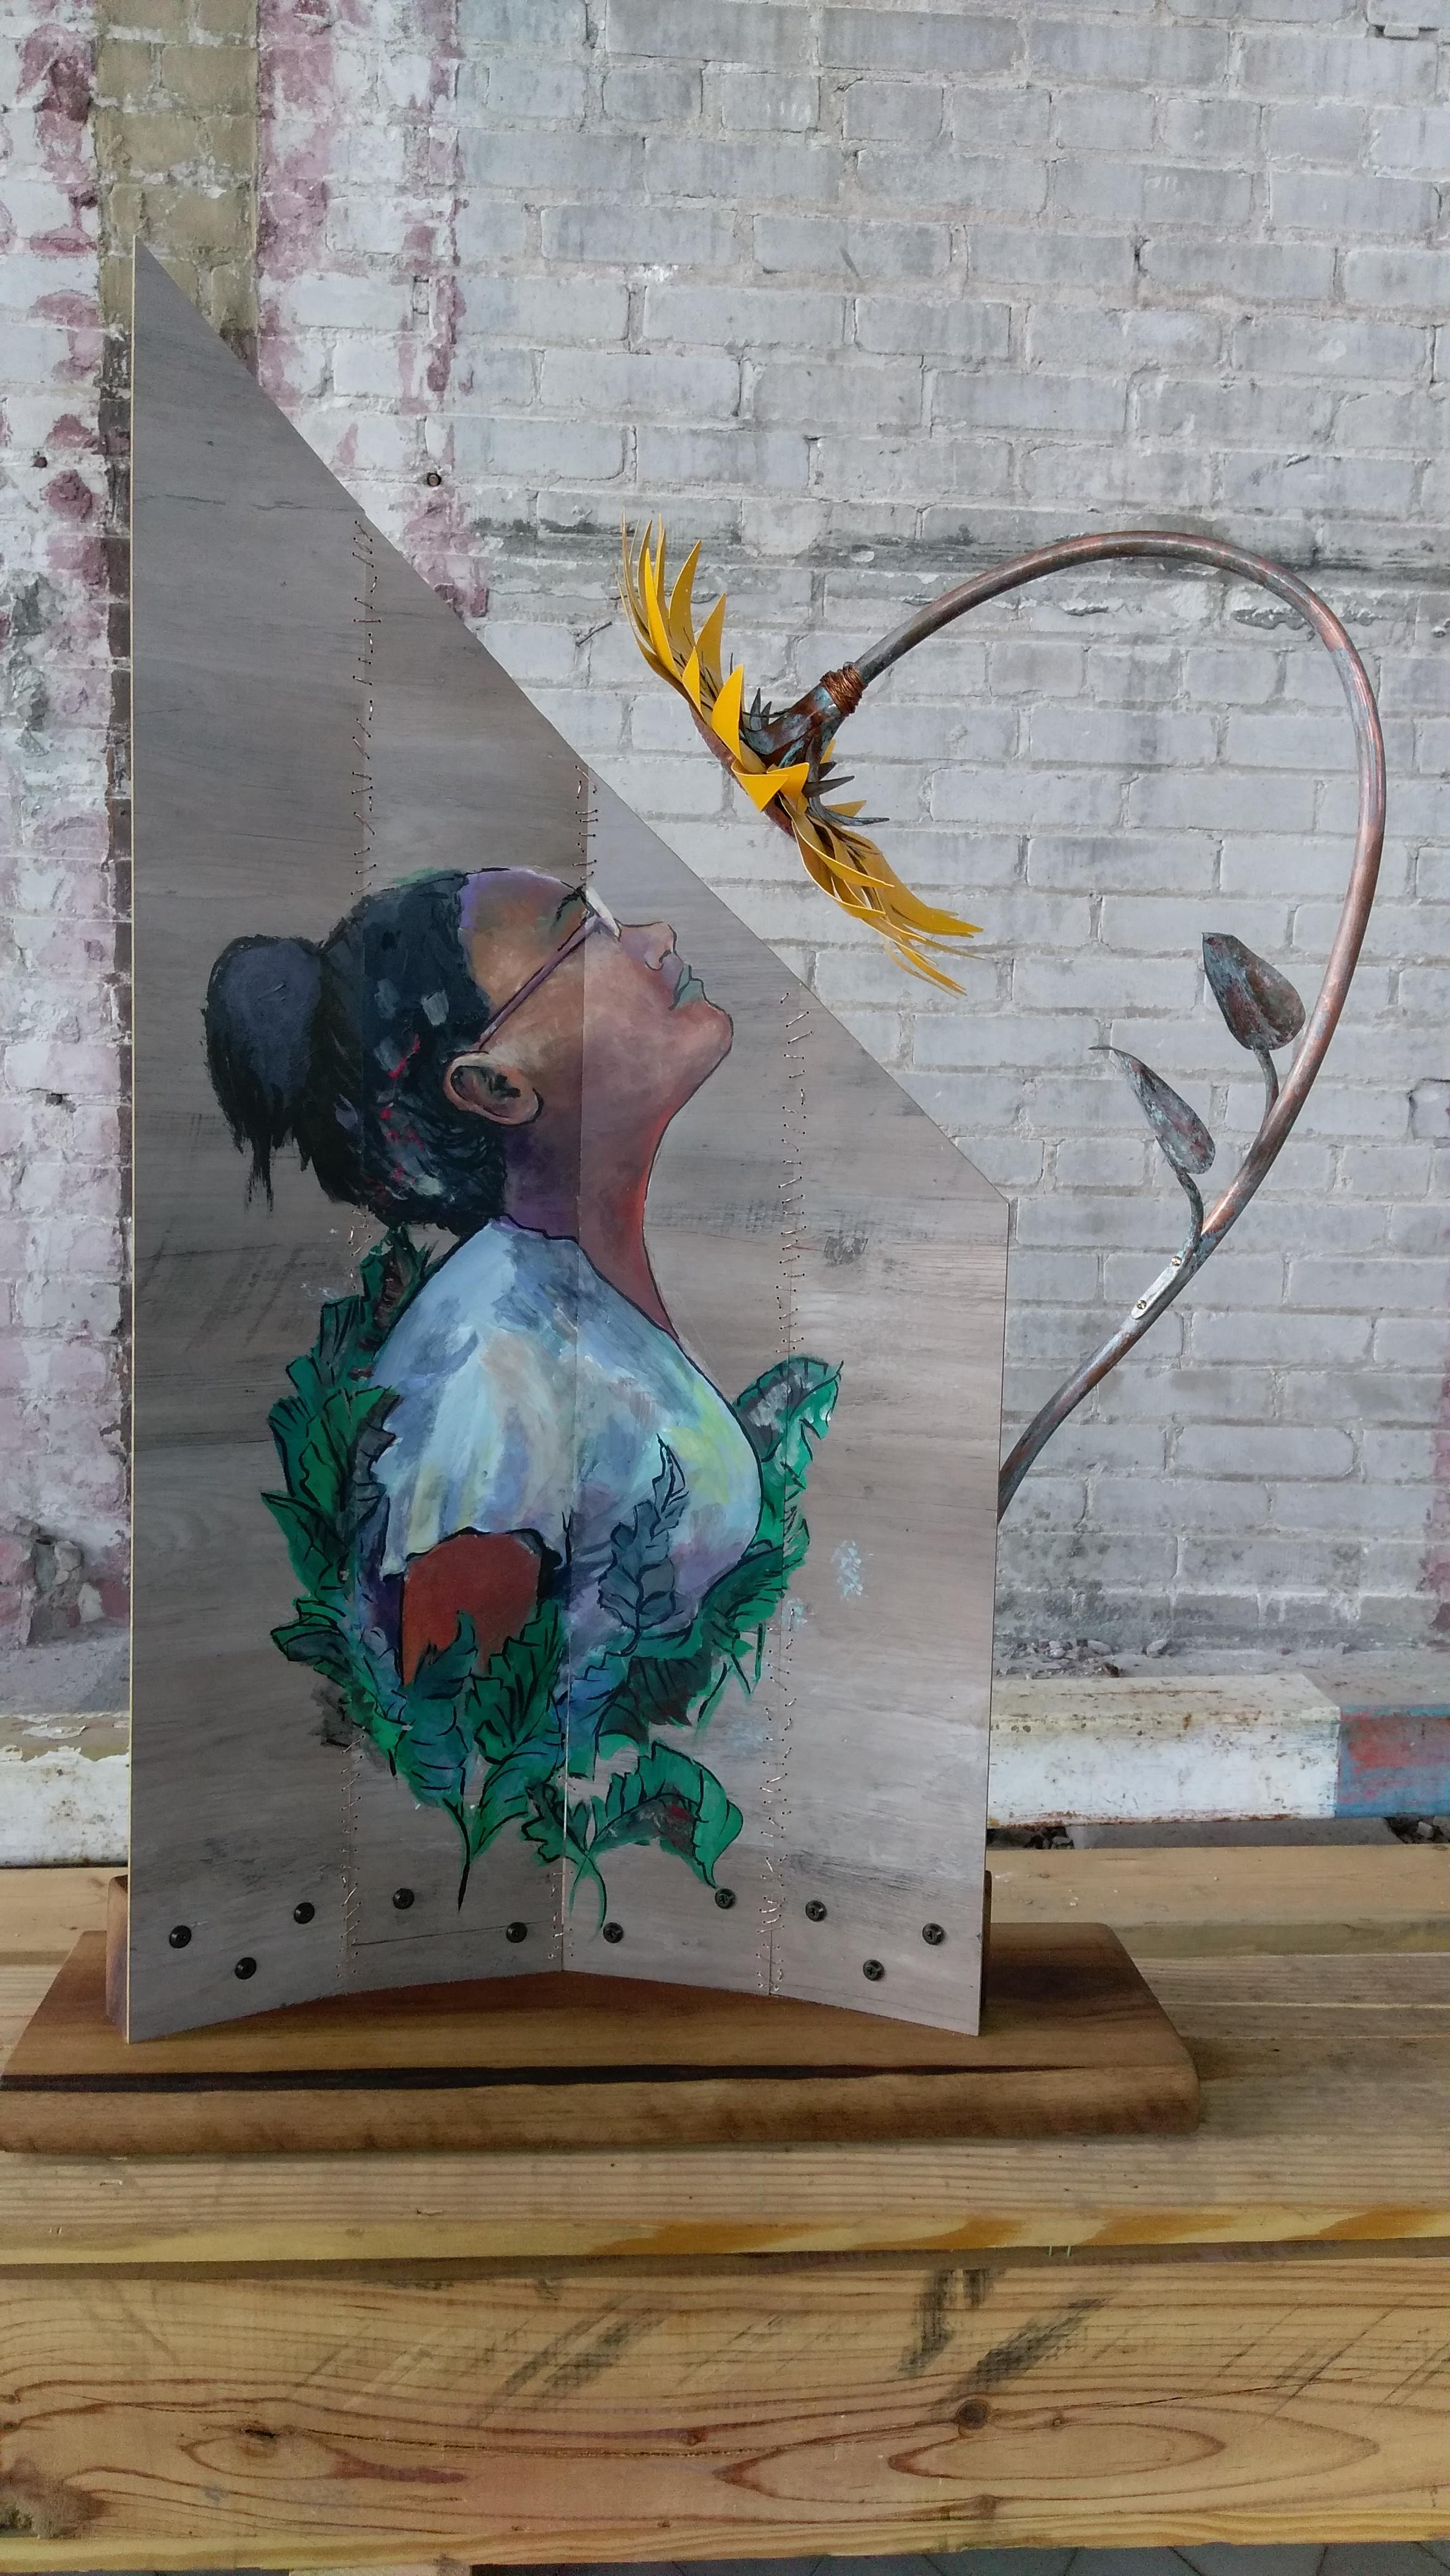 Keenan Lampe & Jacqueline Joyce (20 Ton Studios) - Mixed Media (faux wood panel, acrylic, copper, spray paint, hardwood). 37